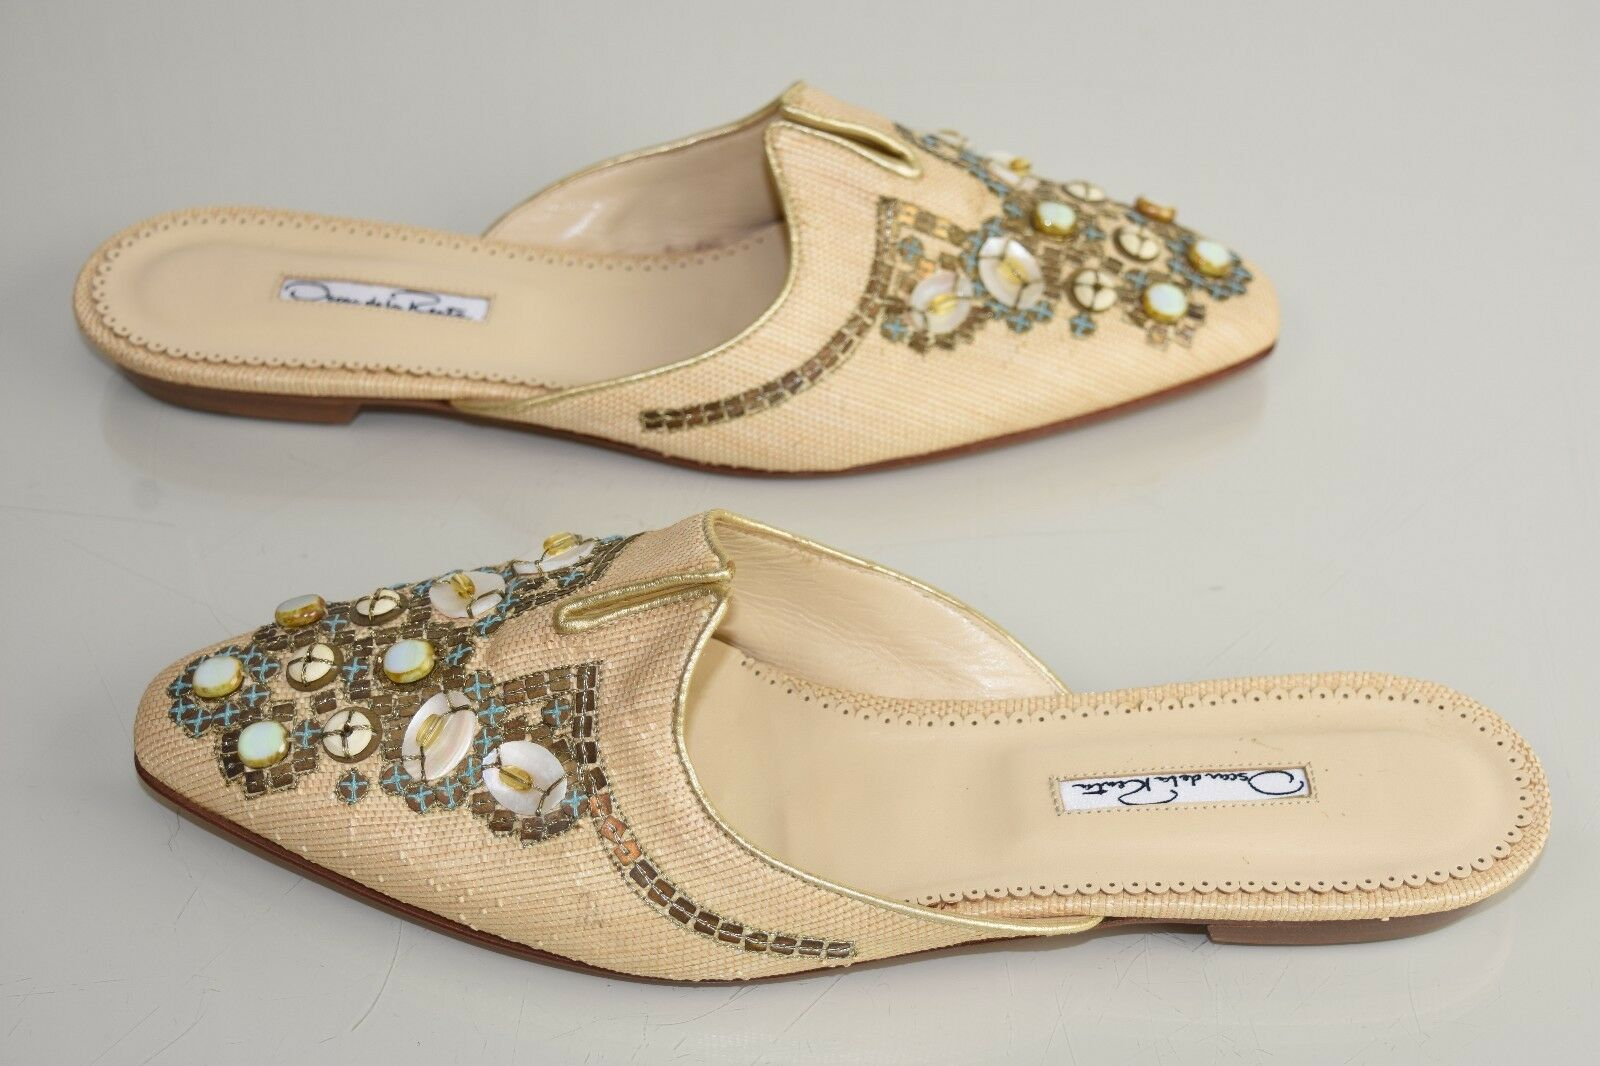 presa NEW Oscar Oscar Oscar de la Renta Mules Flats BEADED Beige Raffia Straw Sequins scarpe 40.5  il più recente